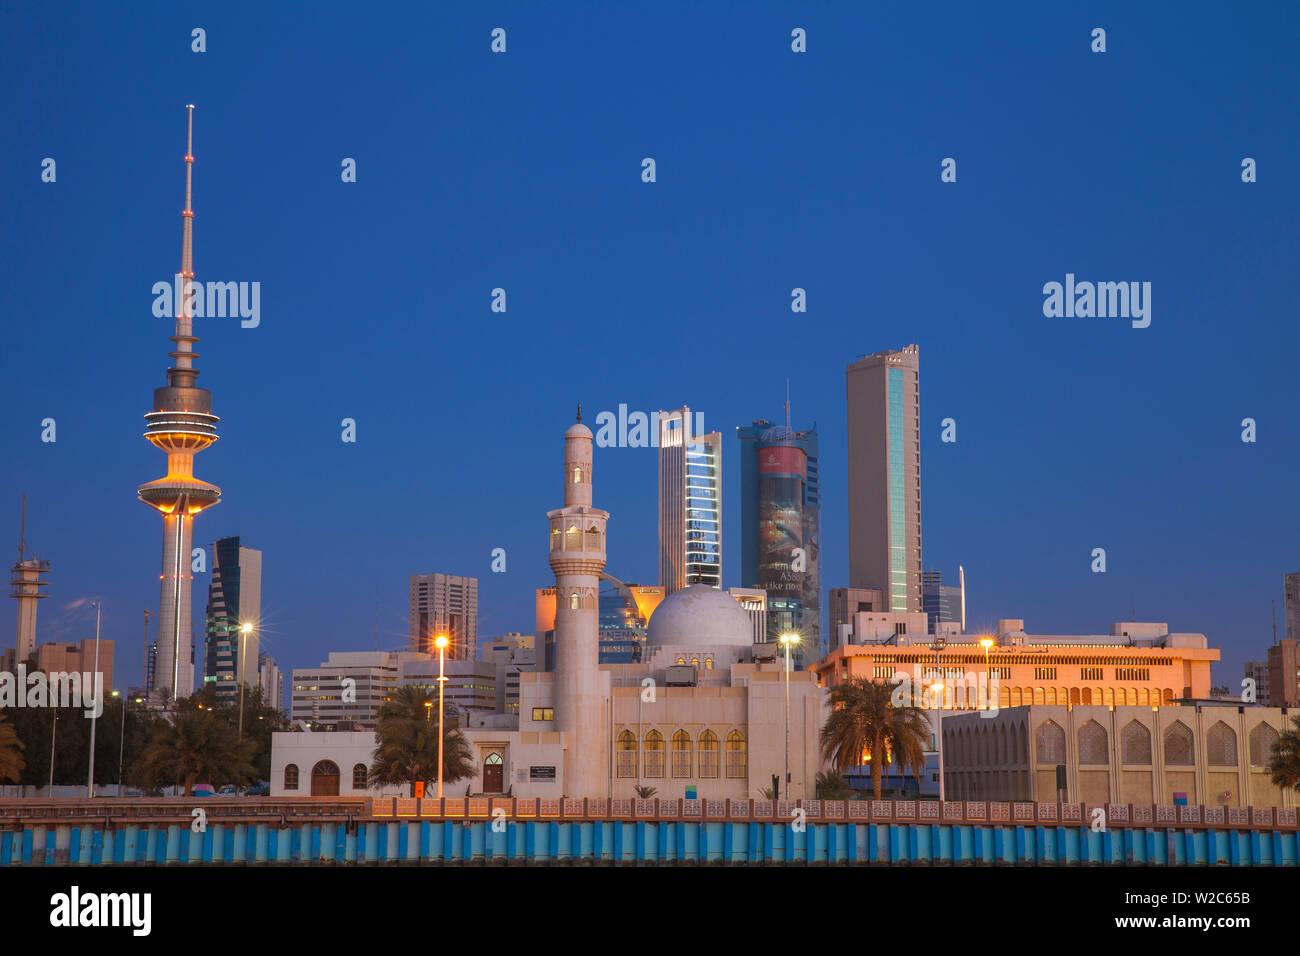 Kuwait, Kuwait City, City skyline - Stock Image